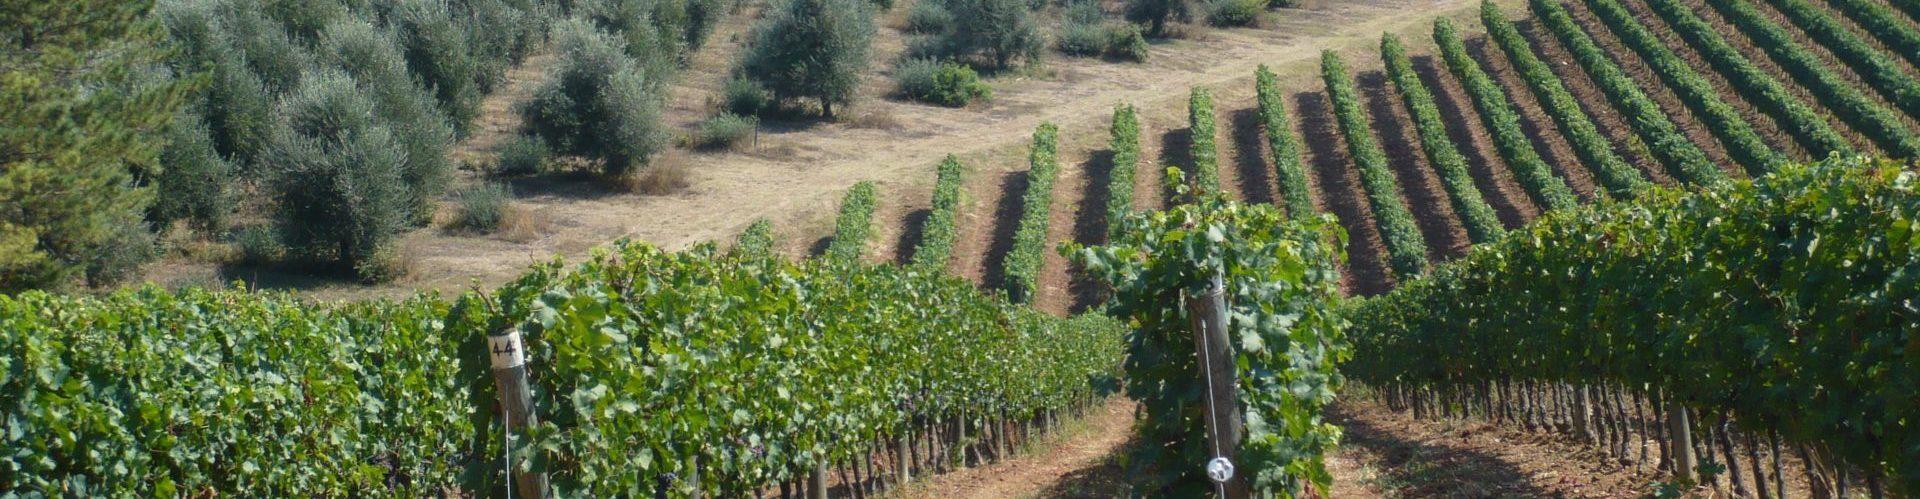 Vineyard of Marche